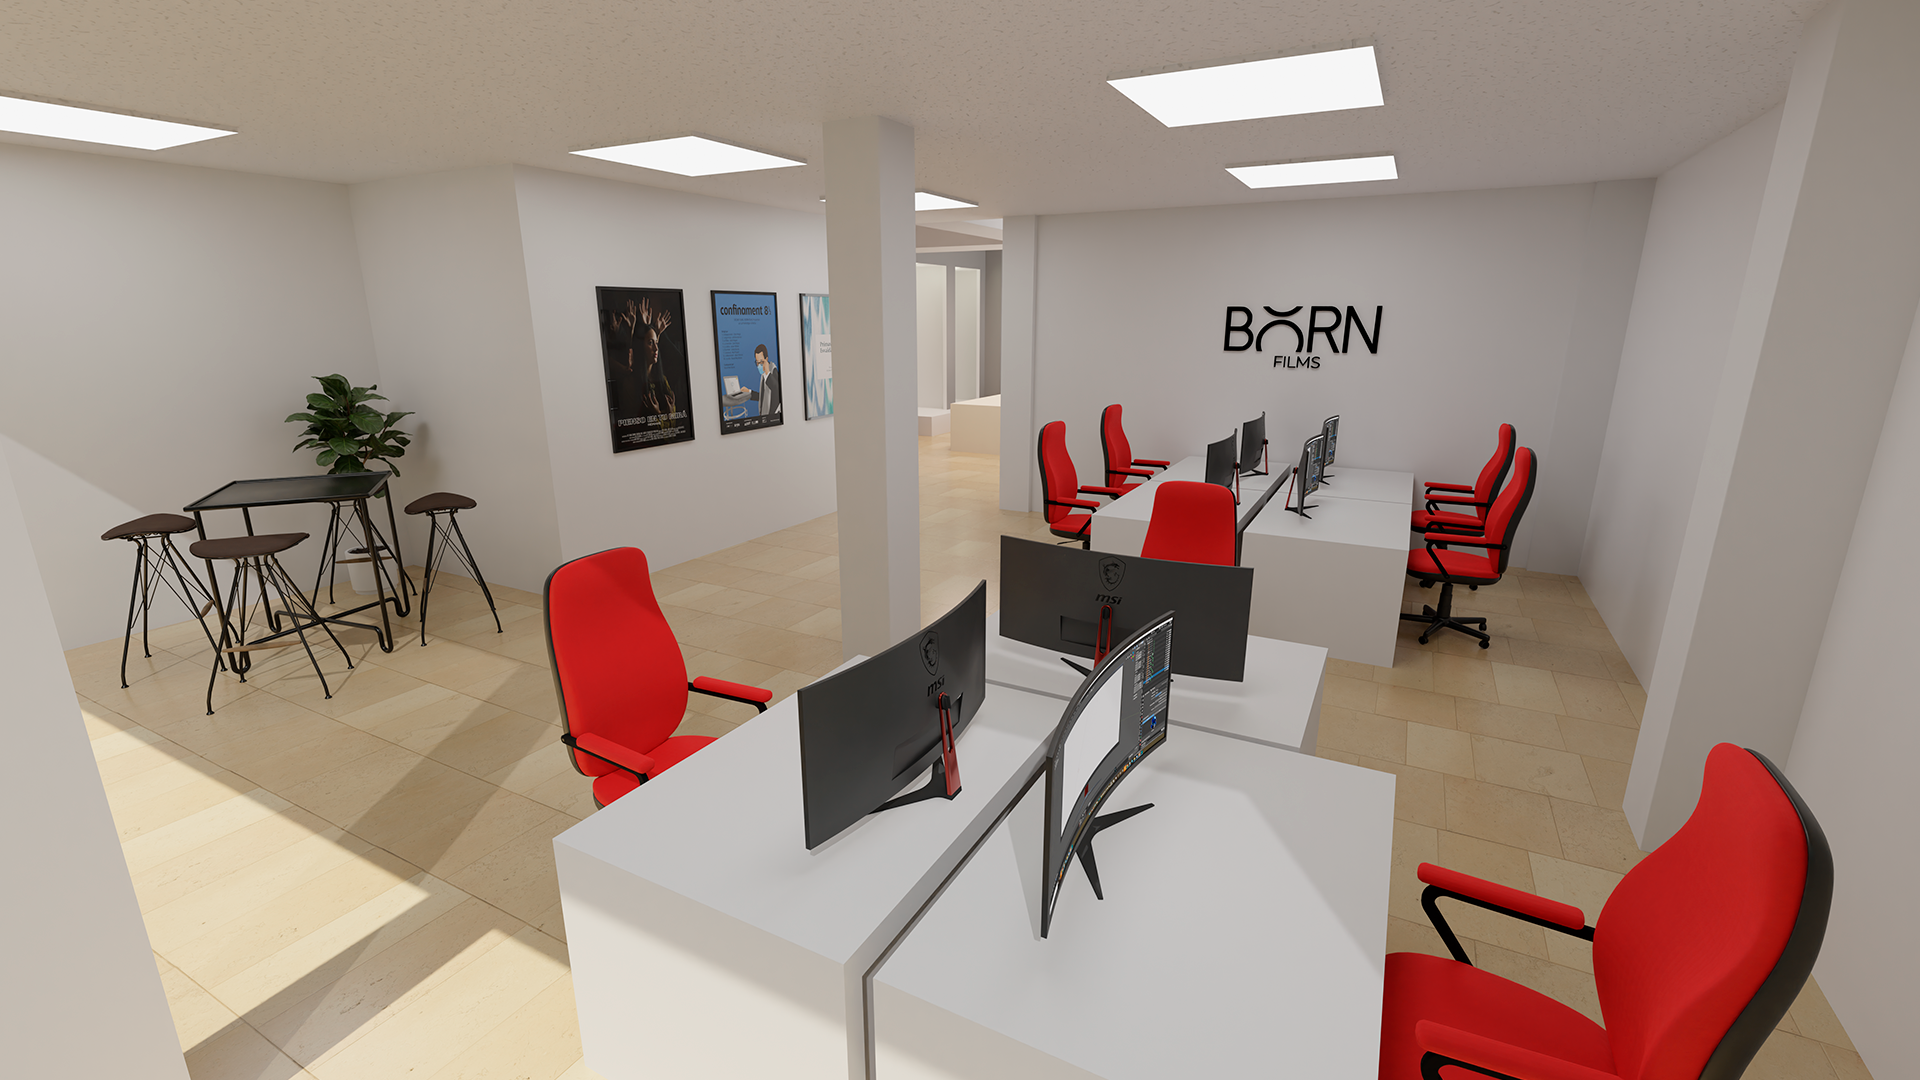 Born Office Render